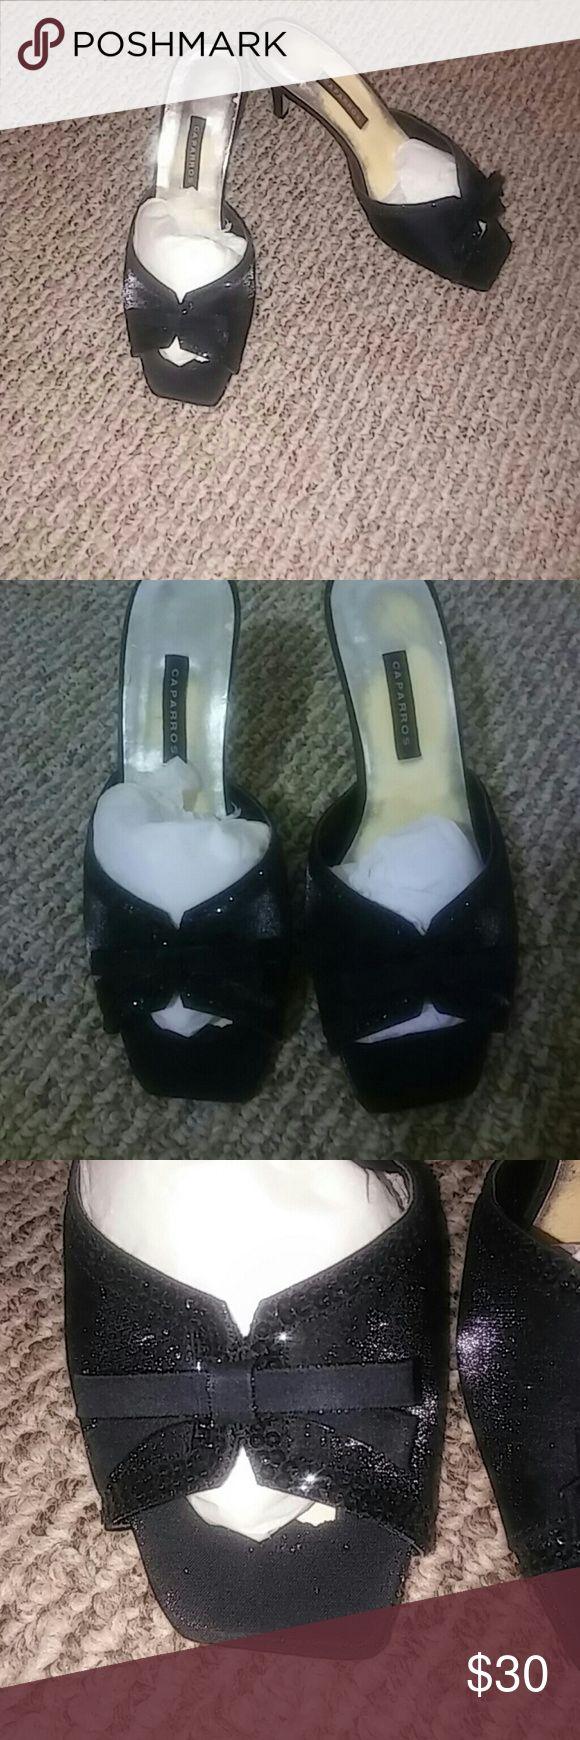 💥SALE💥 🌼Sexy black heels like new🌼 🎉💥FINAL CUT💥🎉 Sexy black heels by Caparros Gently worn Caparros Shoes Heels